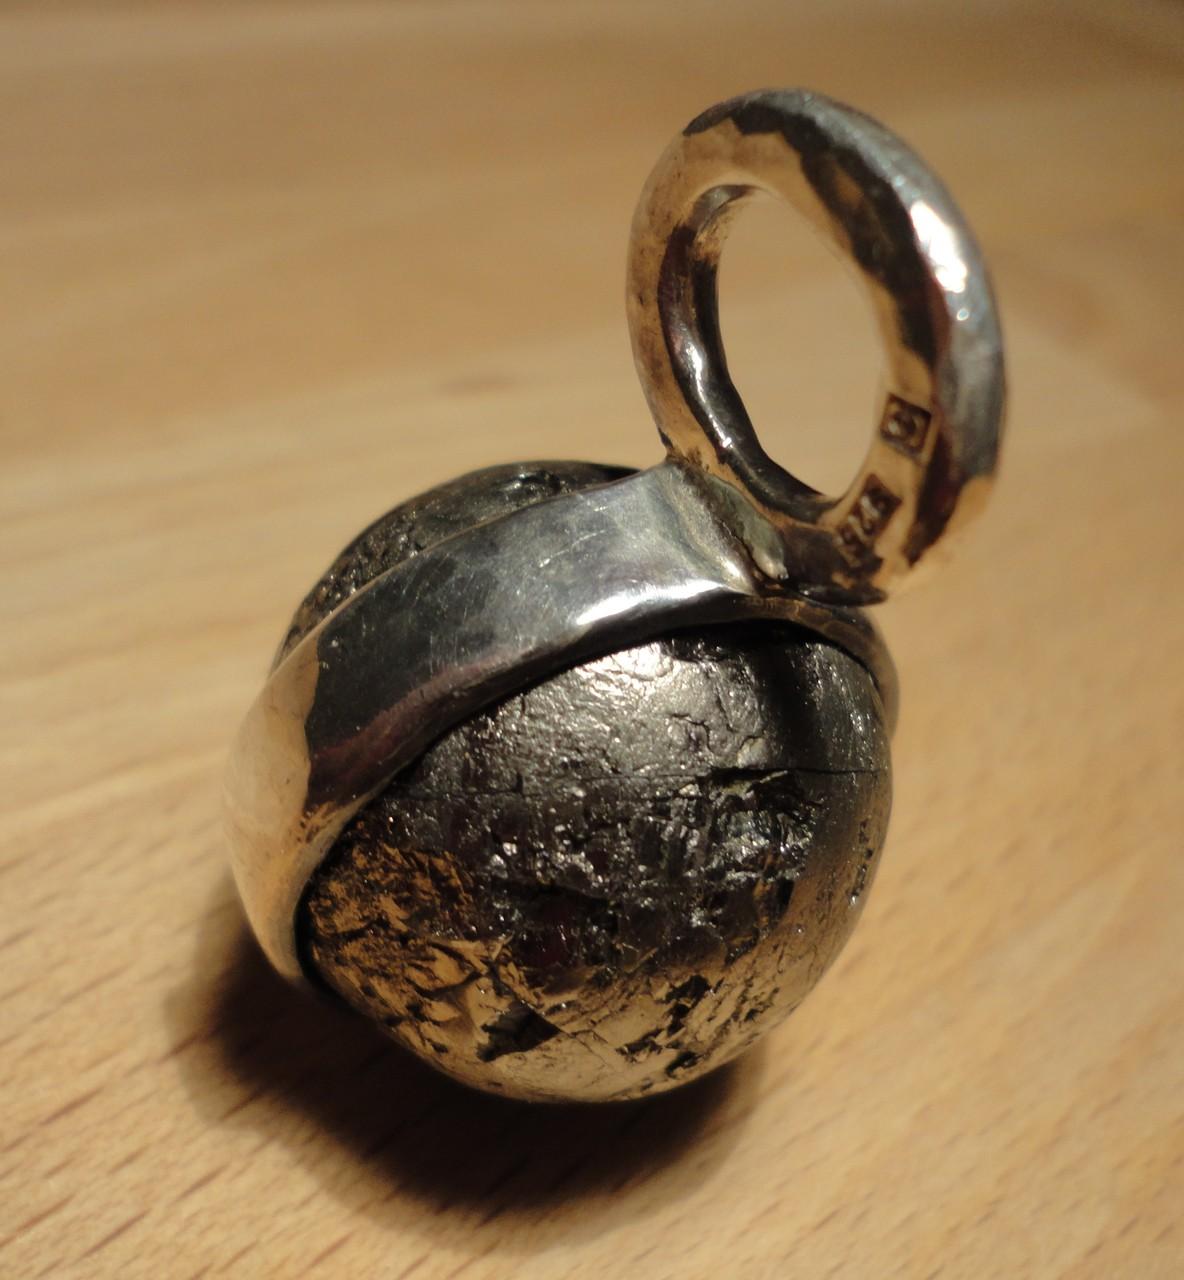 Pyrit-Erdball in Silber-Aufhängung (925 Sterlingsilber) Preis: CHF 220.-